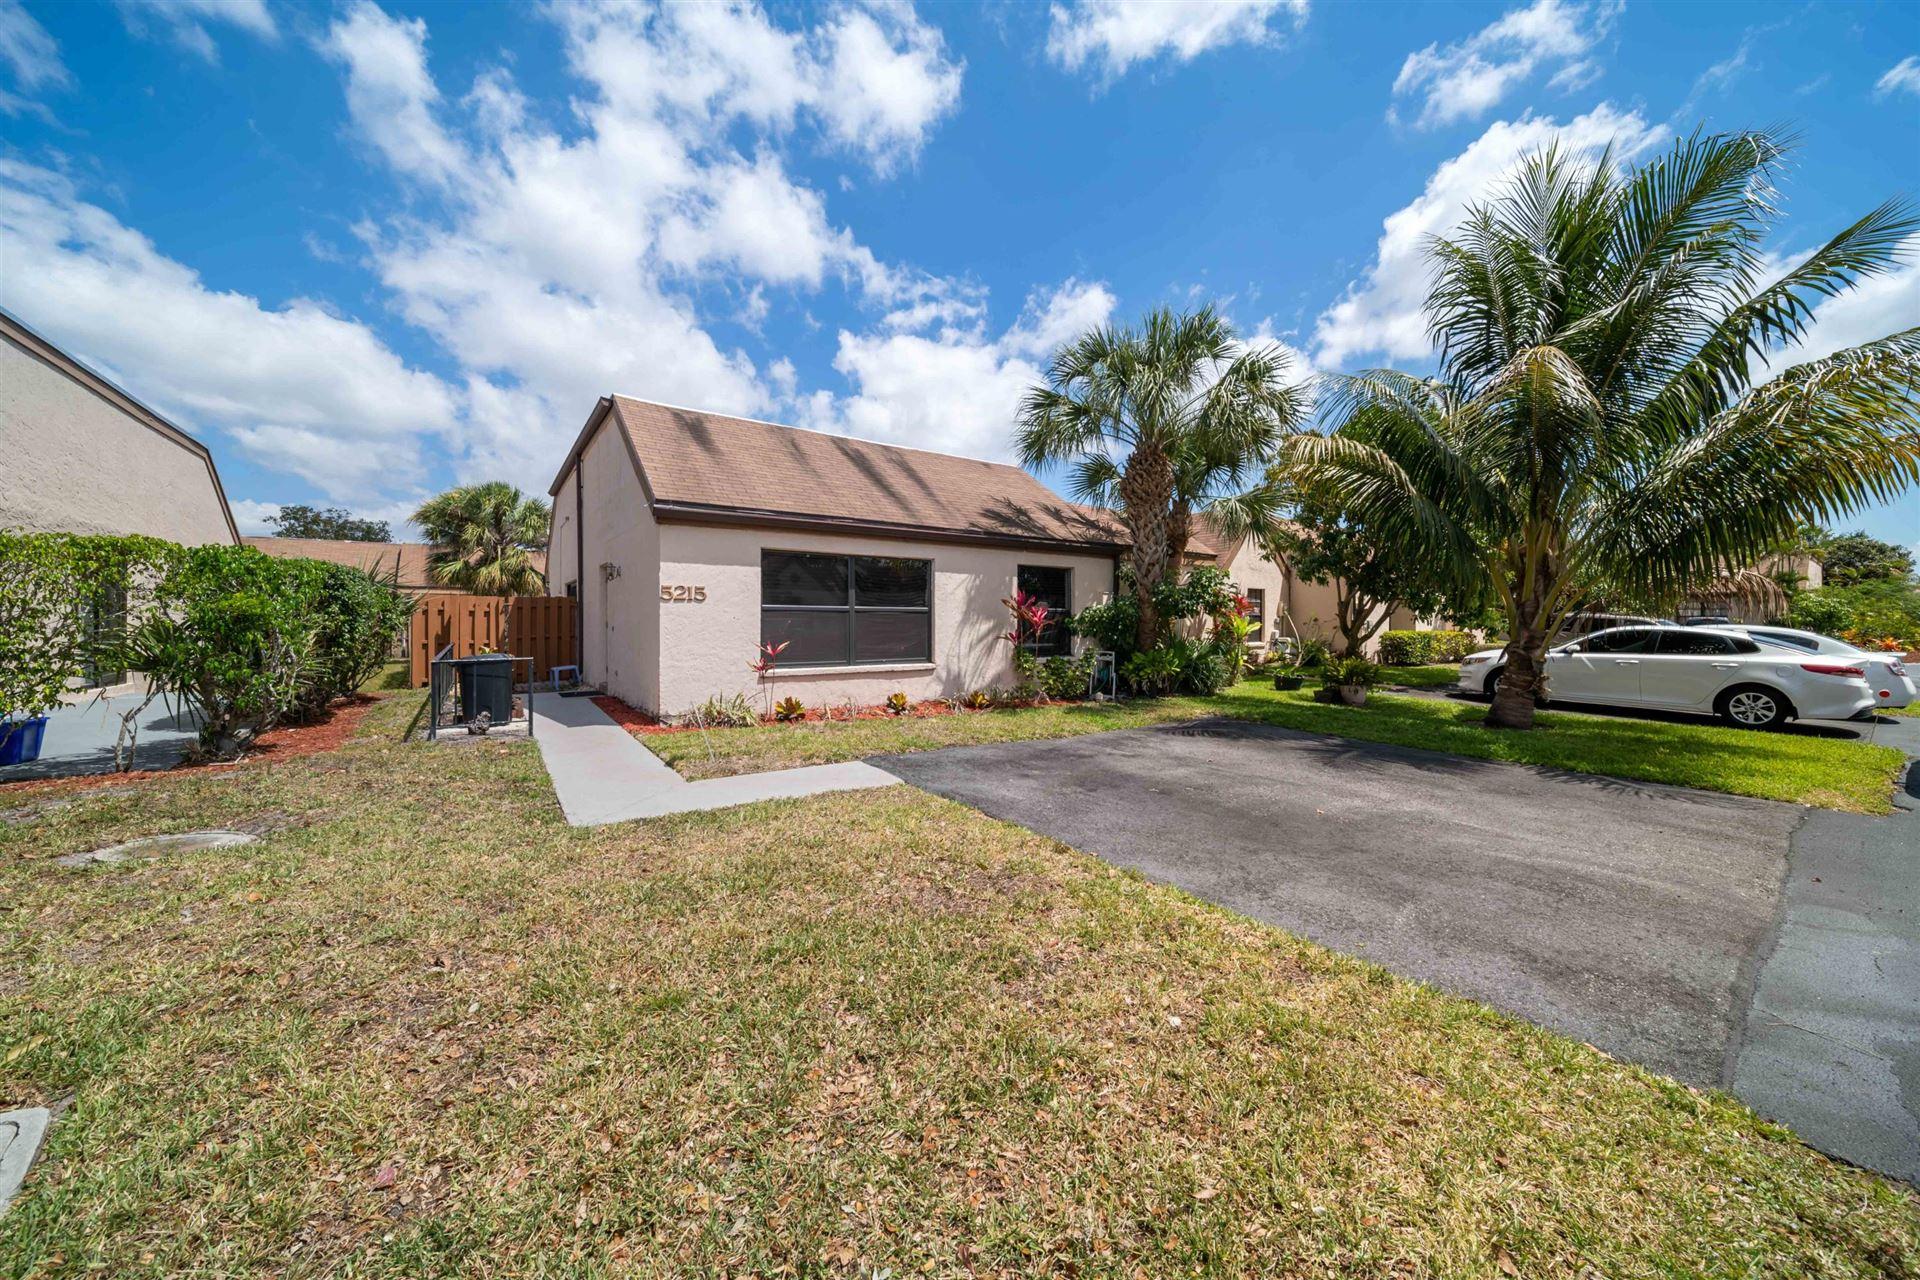 Photo of 5215 Tarregon Lane, Palm Beach Gardens, FL 33418 (MLS # RX-10708242)